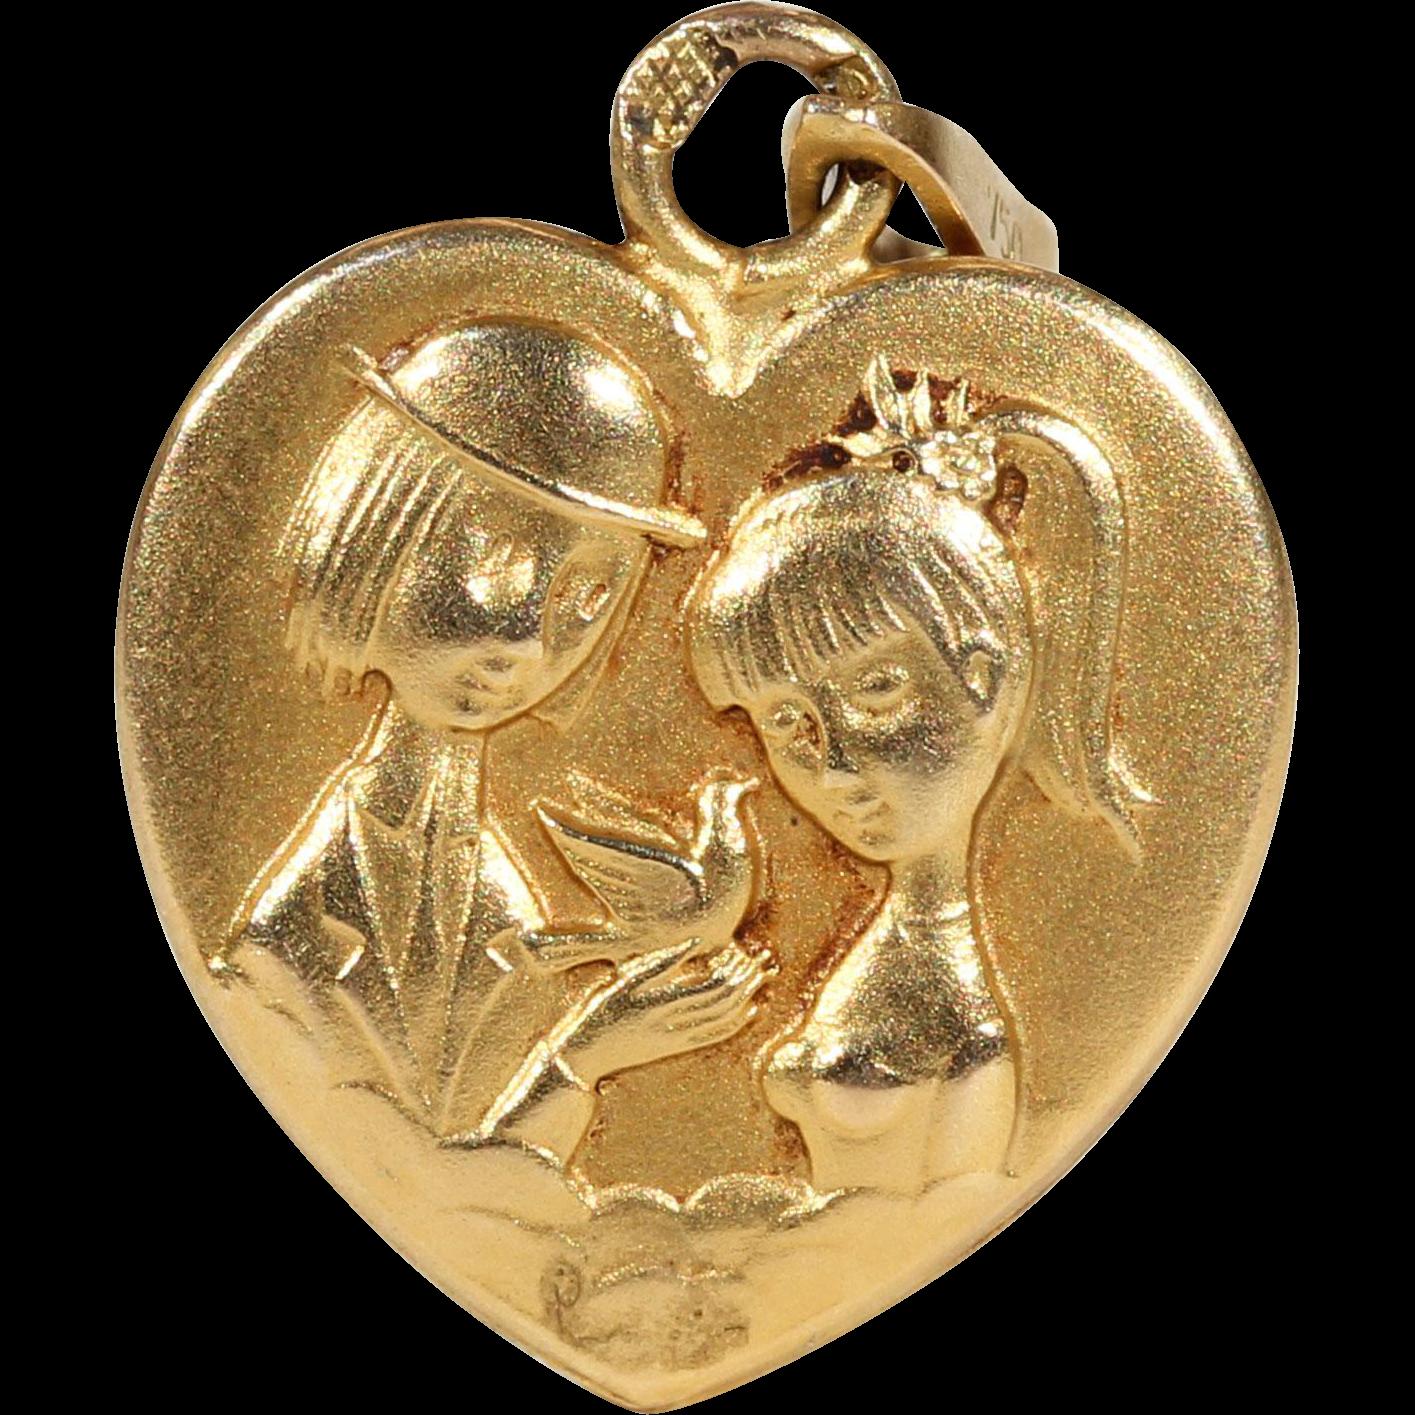 #VintageBeginsHere at www.rubylane.com @rubylanecom -- 1940s Peynet Gold Heart Pendant 'Les Amoureux de Peynet 18 karat